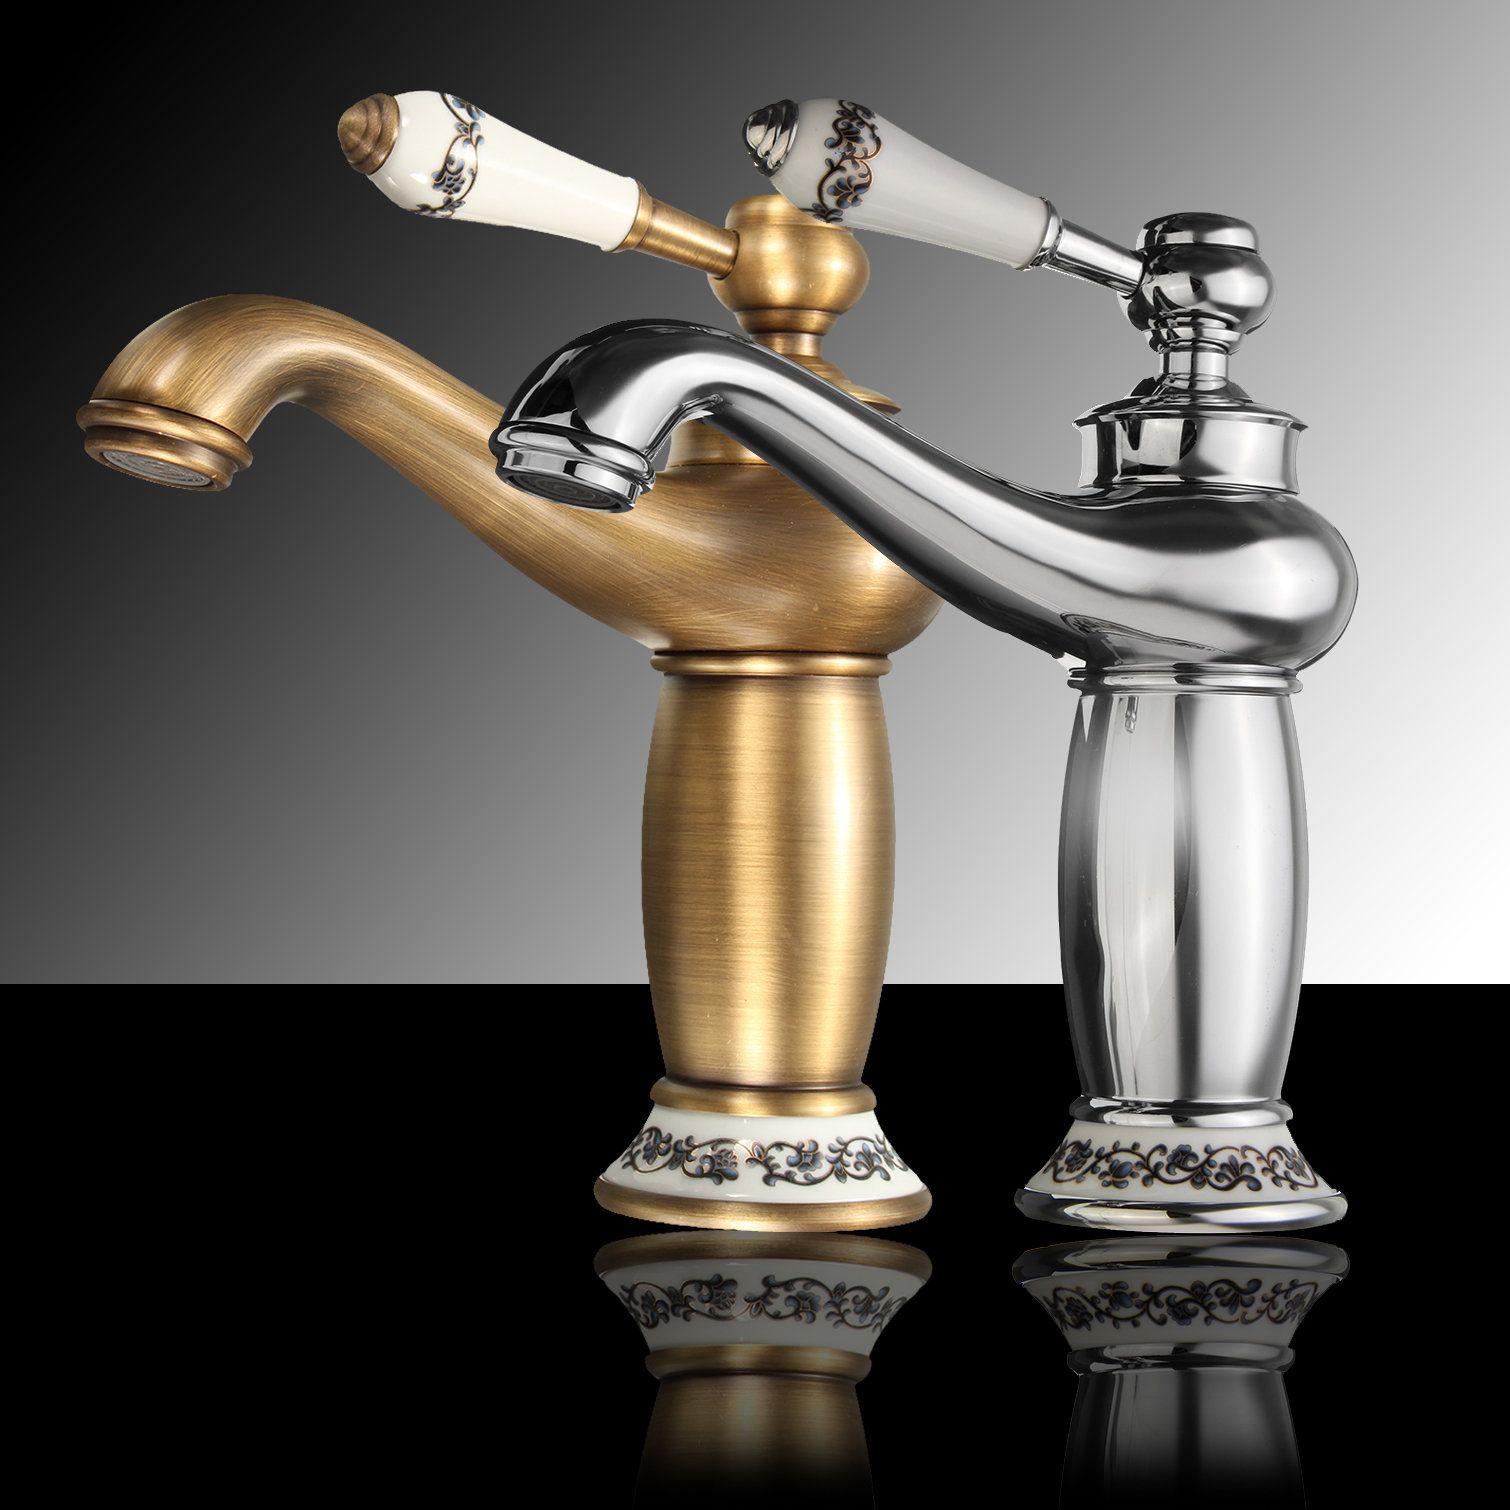 Antique Bronze Brass Faucet Hot & Cold Mixer Tap Ceramic Handle ...